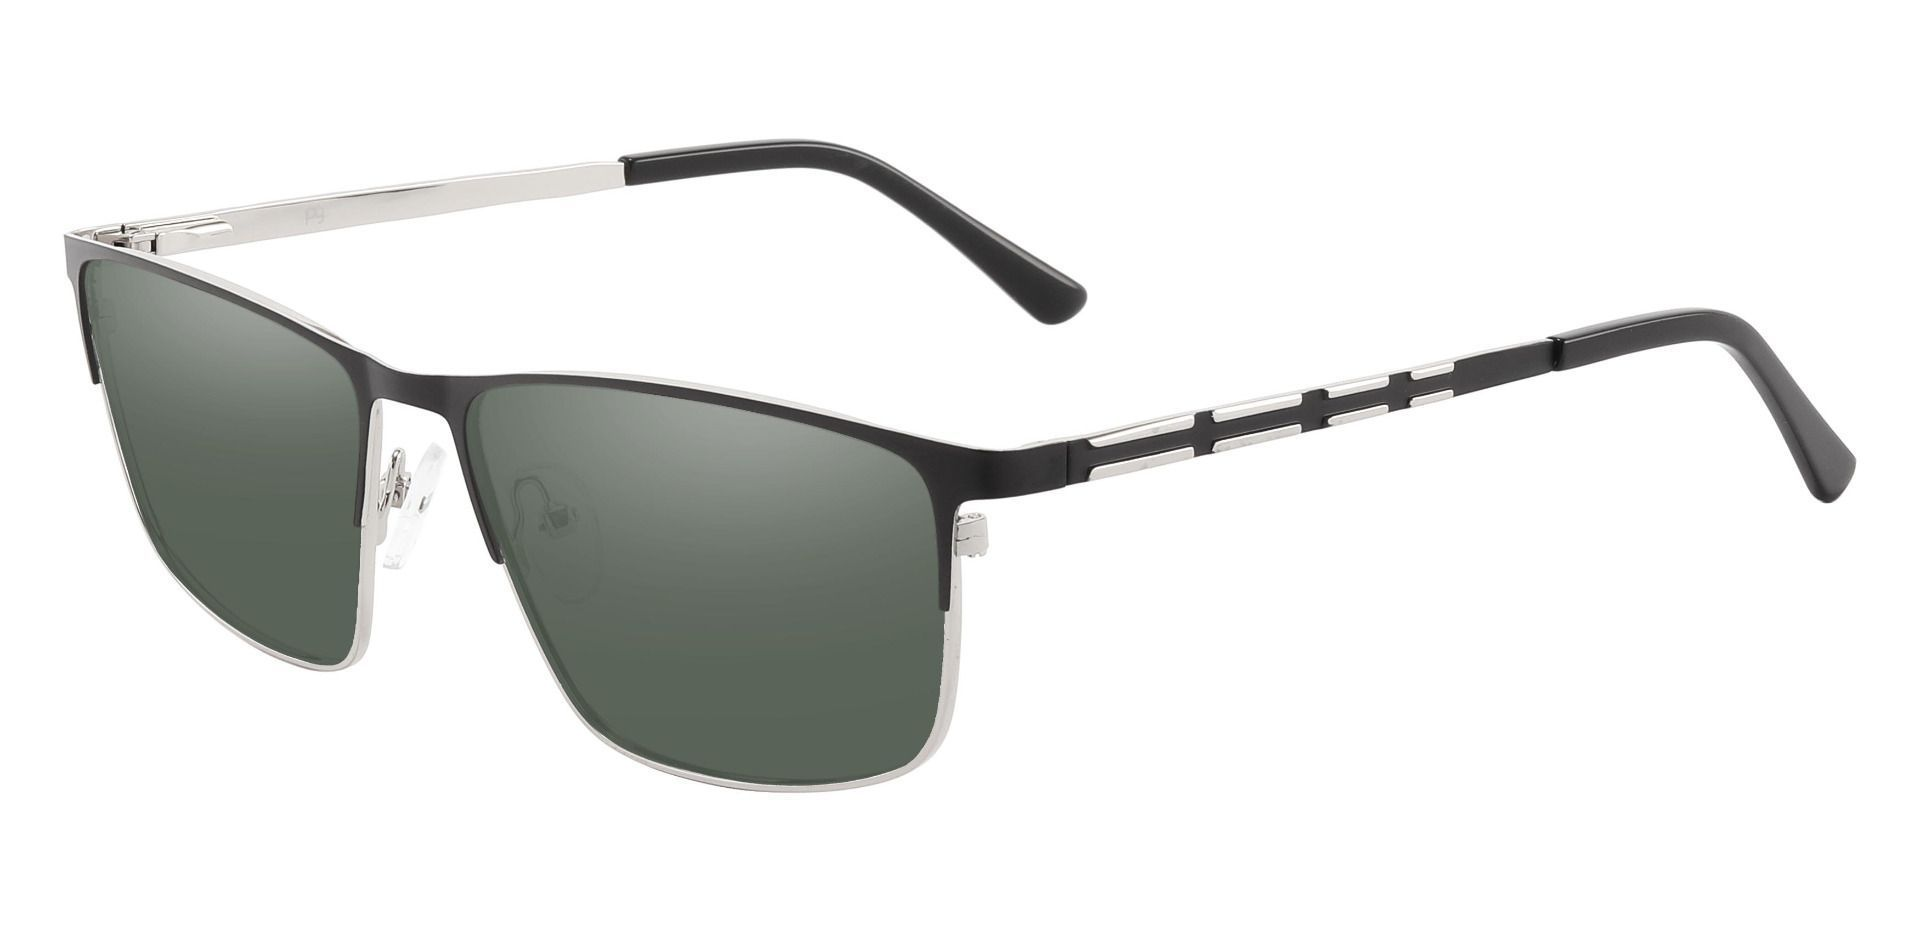 Hamlet Browline Prescription Sunglasses - Black Frame With Green Lenses